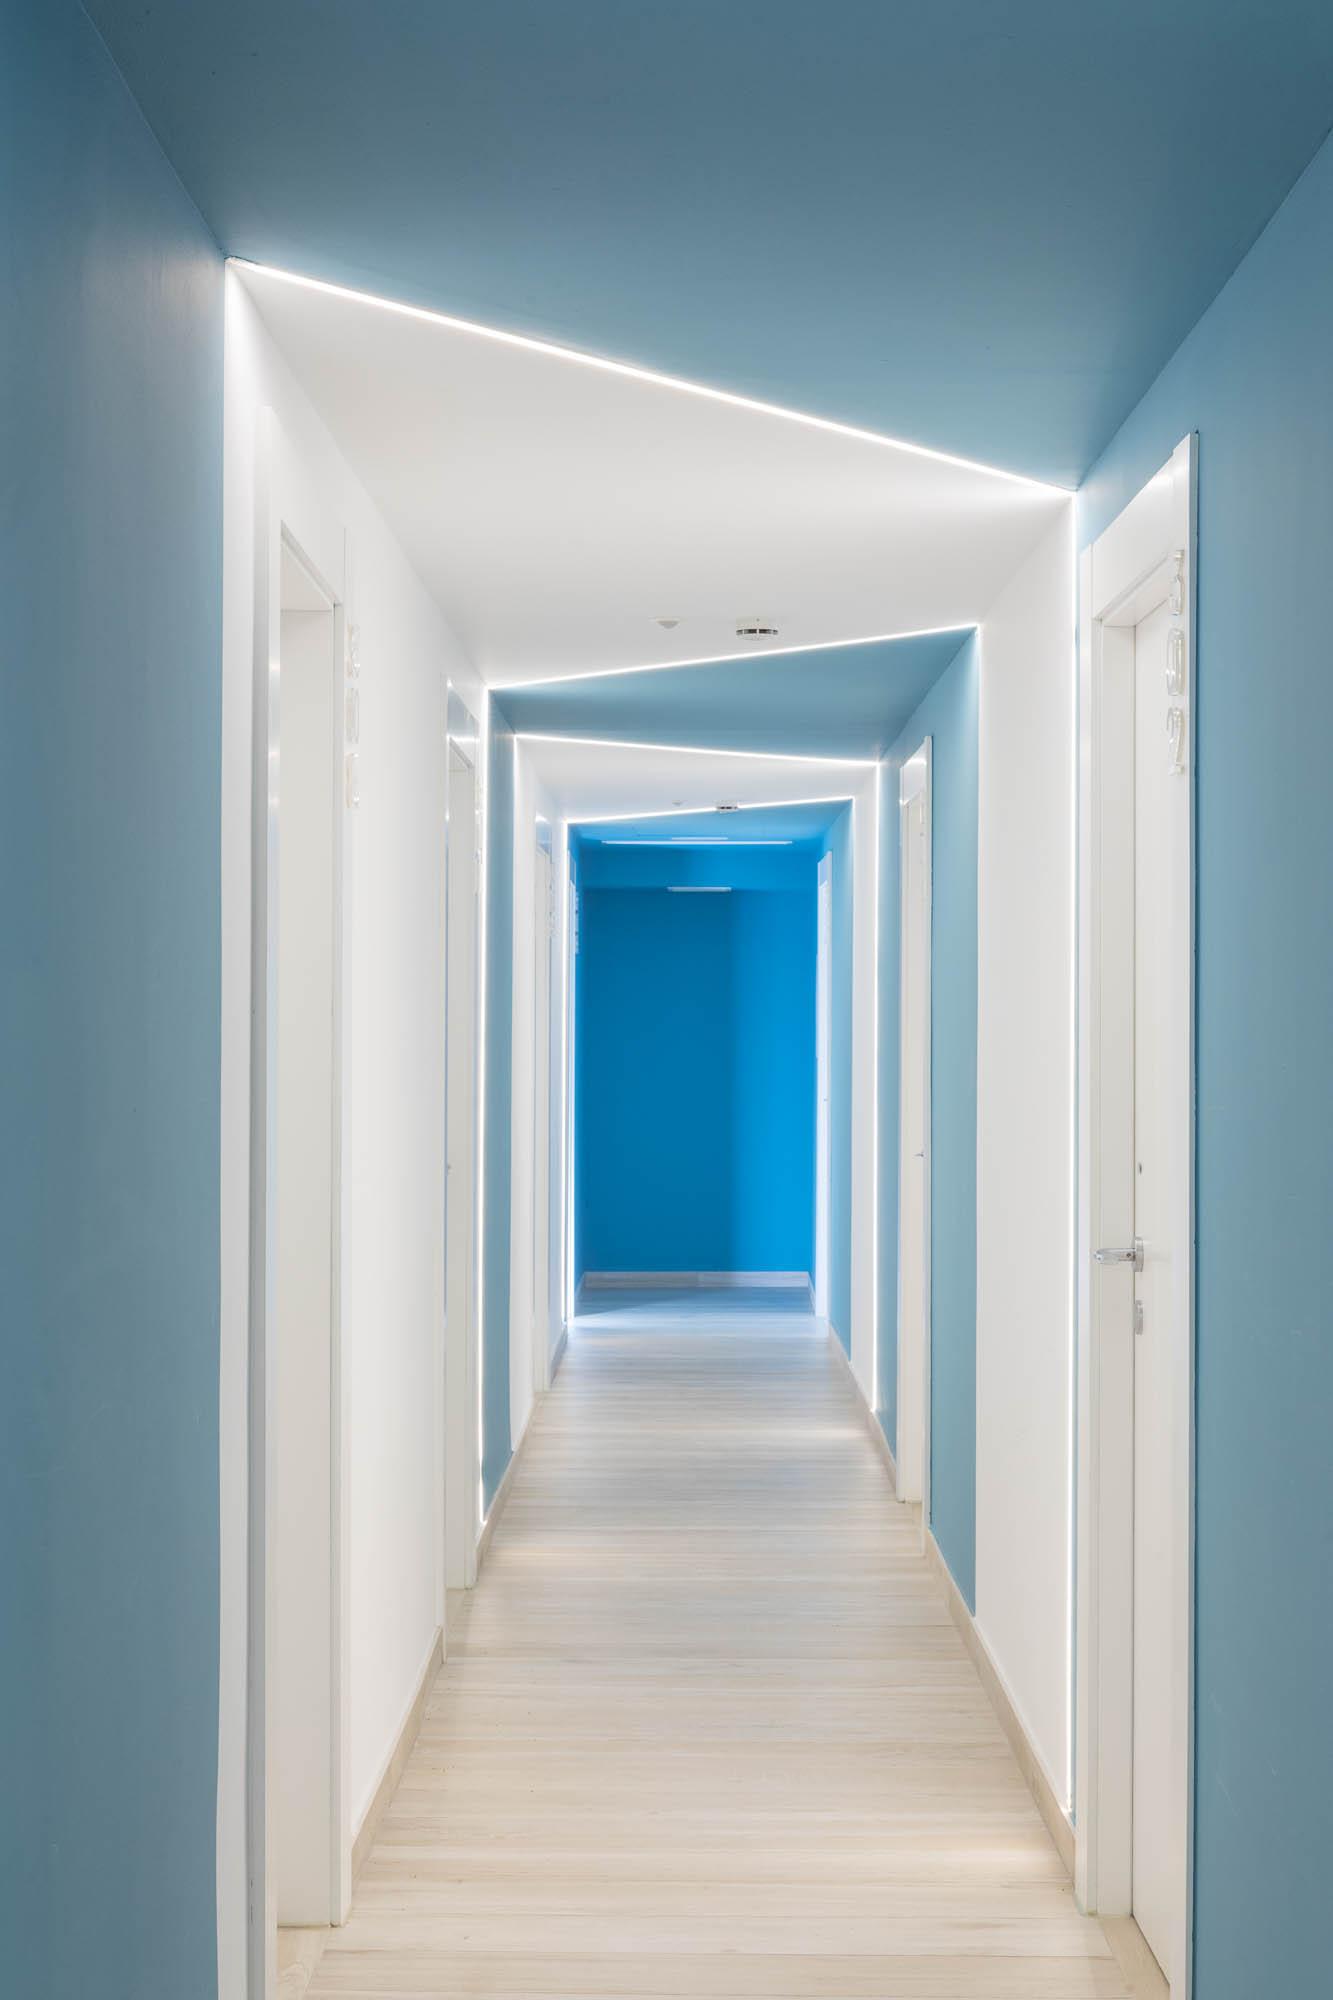 Pasillo Azul HOTEL ROCATEL diseño por ROSA COLET INTERIOR DESIGN